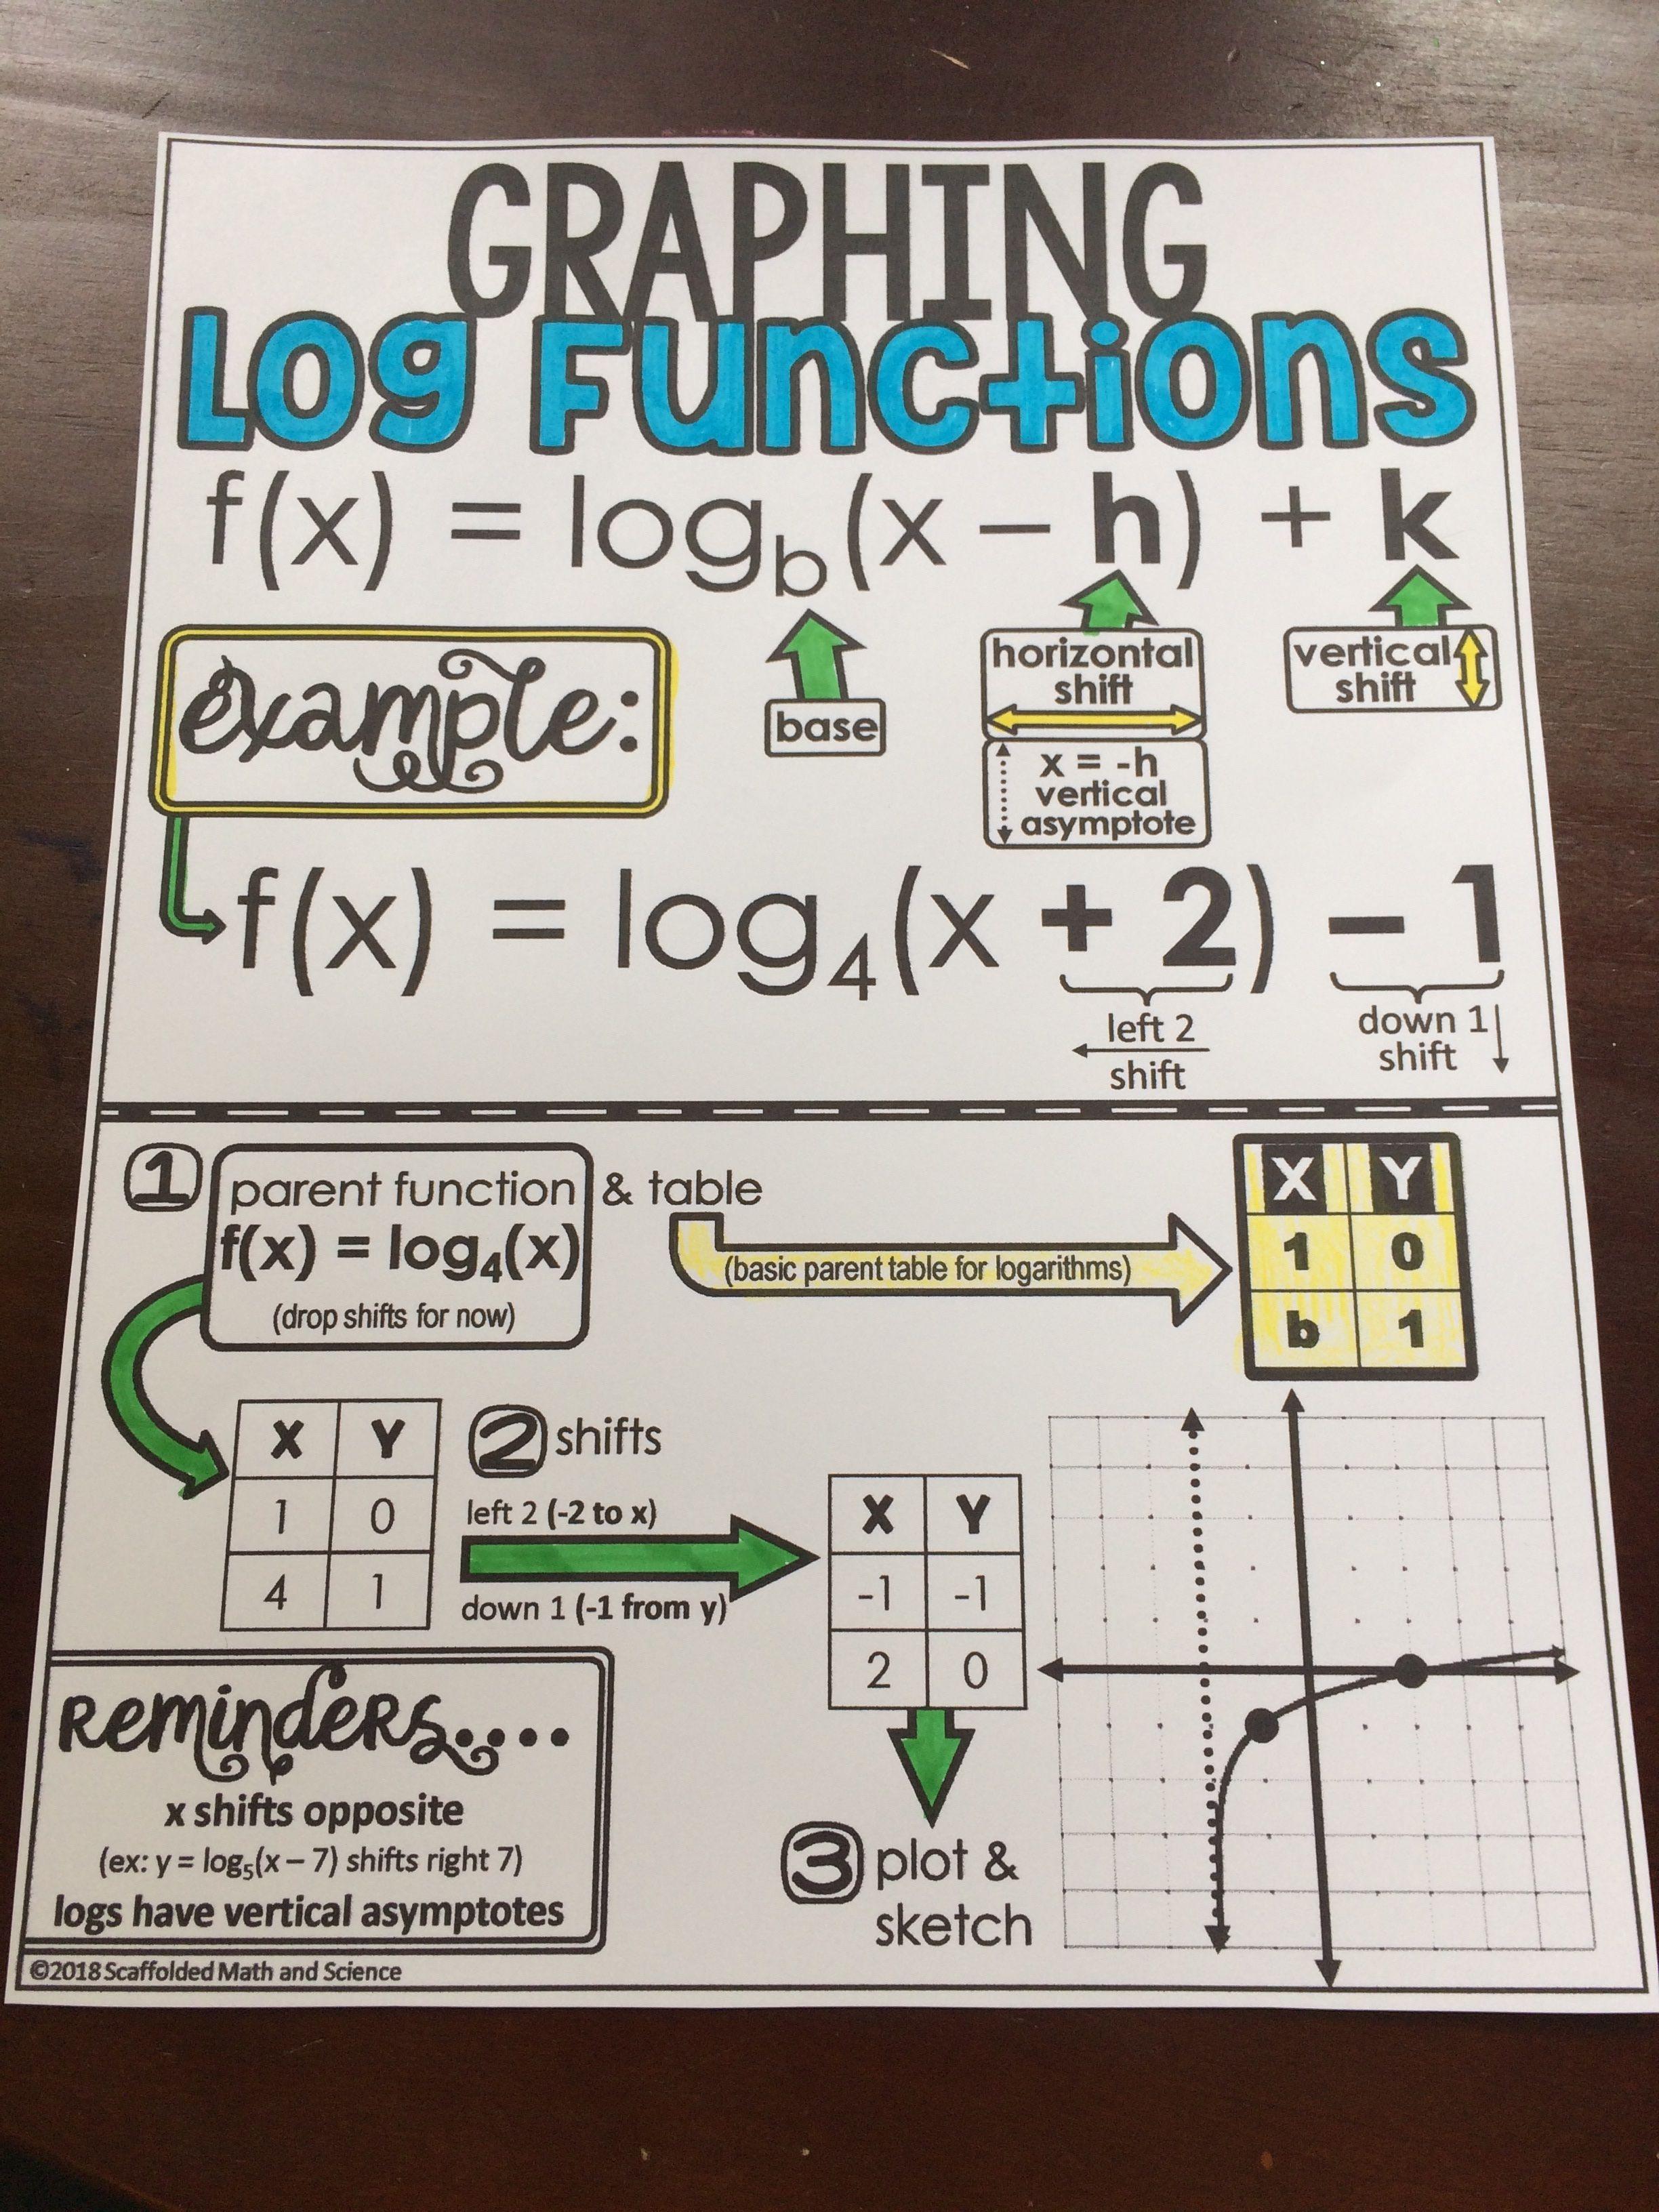 Graphing Logarithmic Functions Cheat Sheet In 2020 Math Notebooks Math Cheat Sheet Teaching Algebra